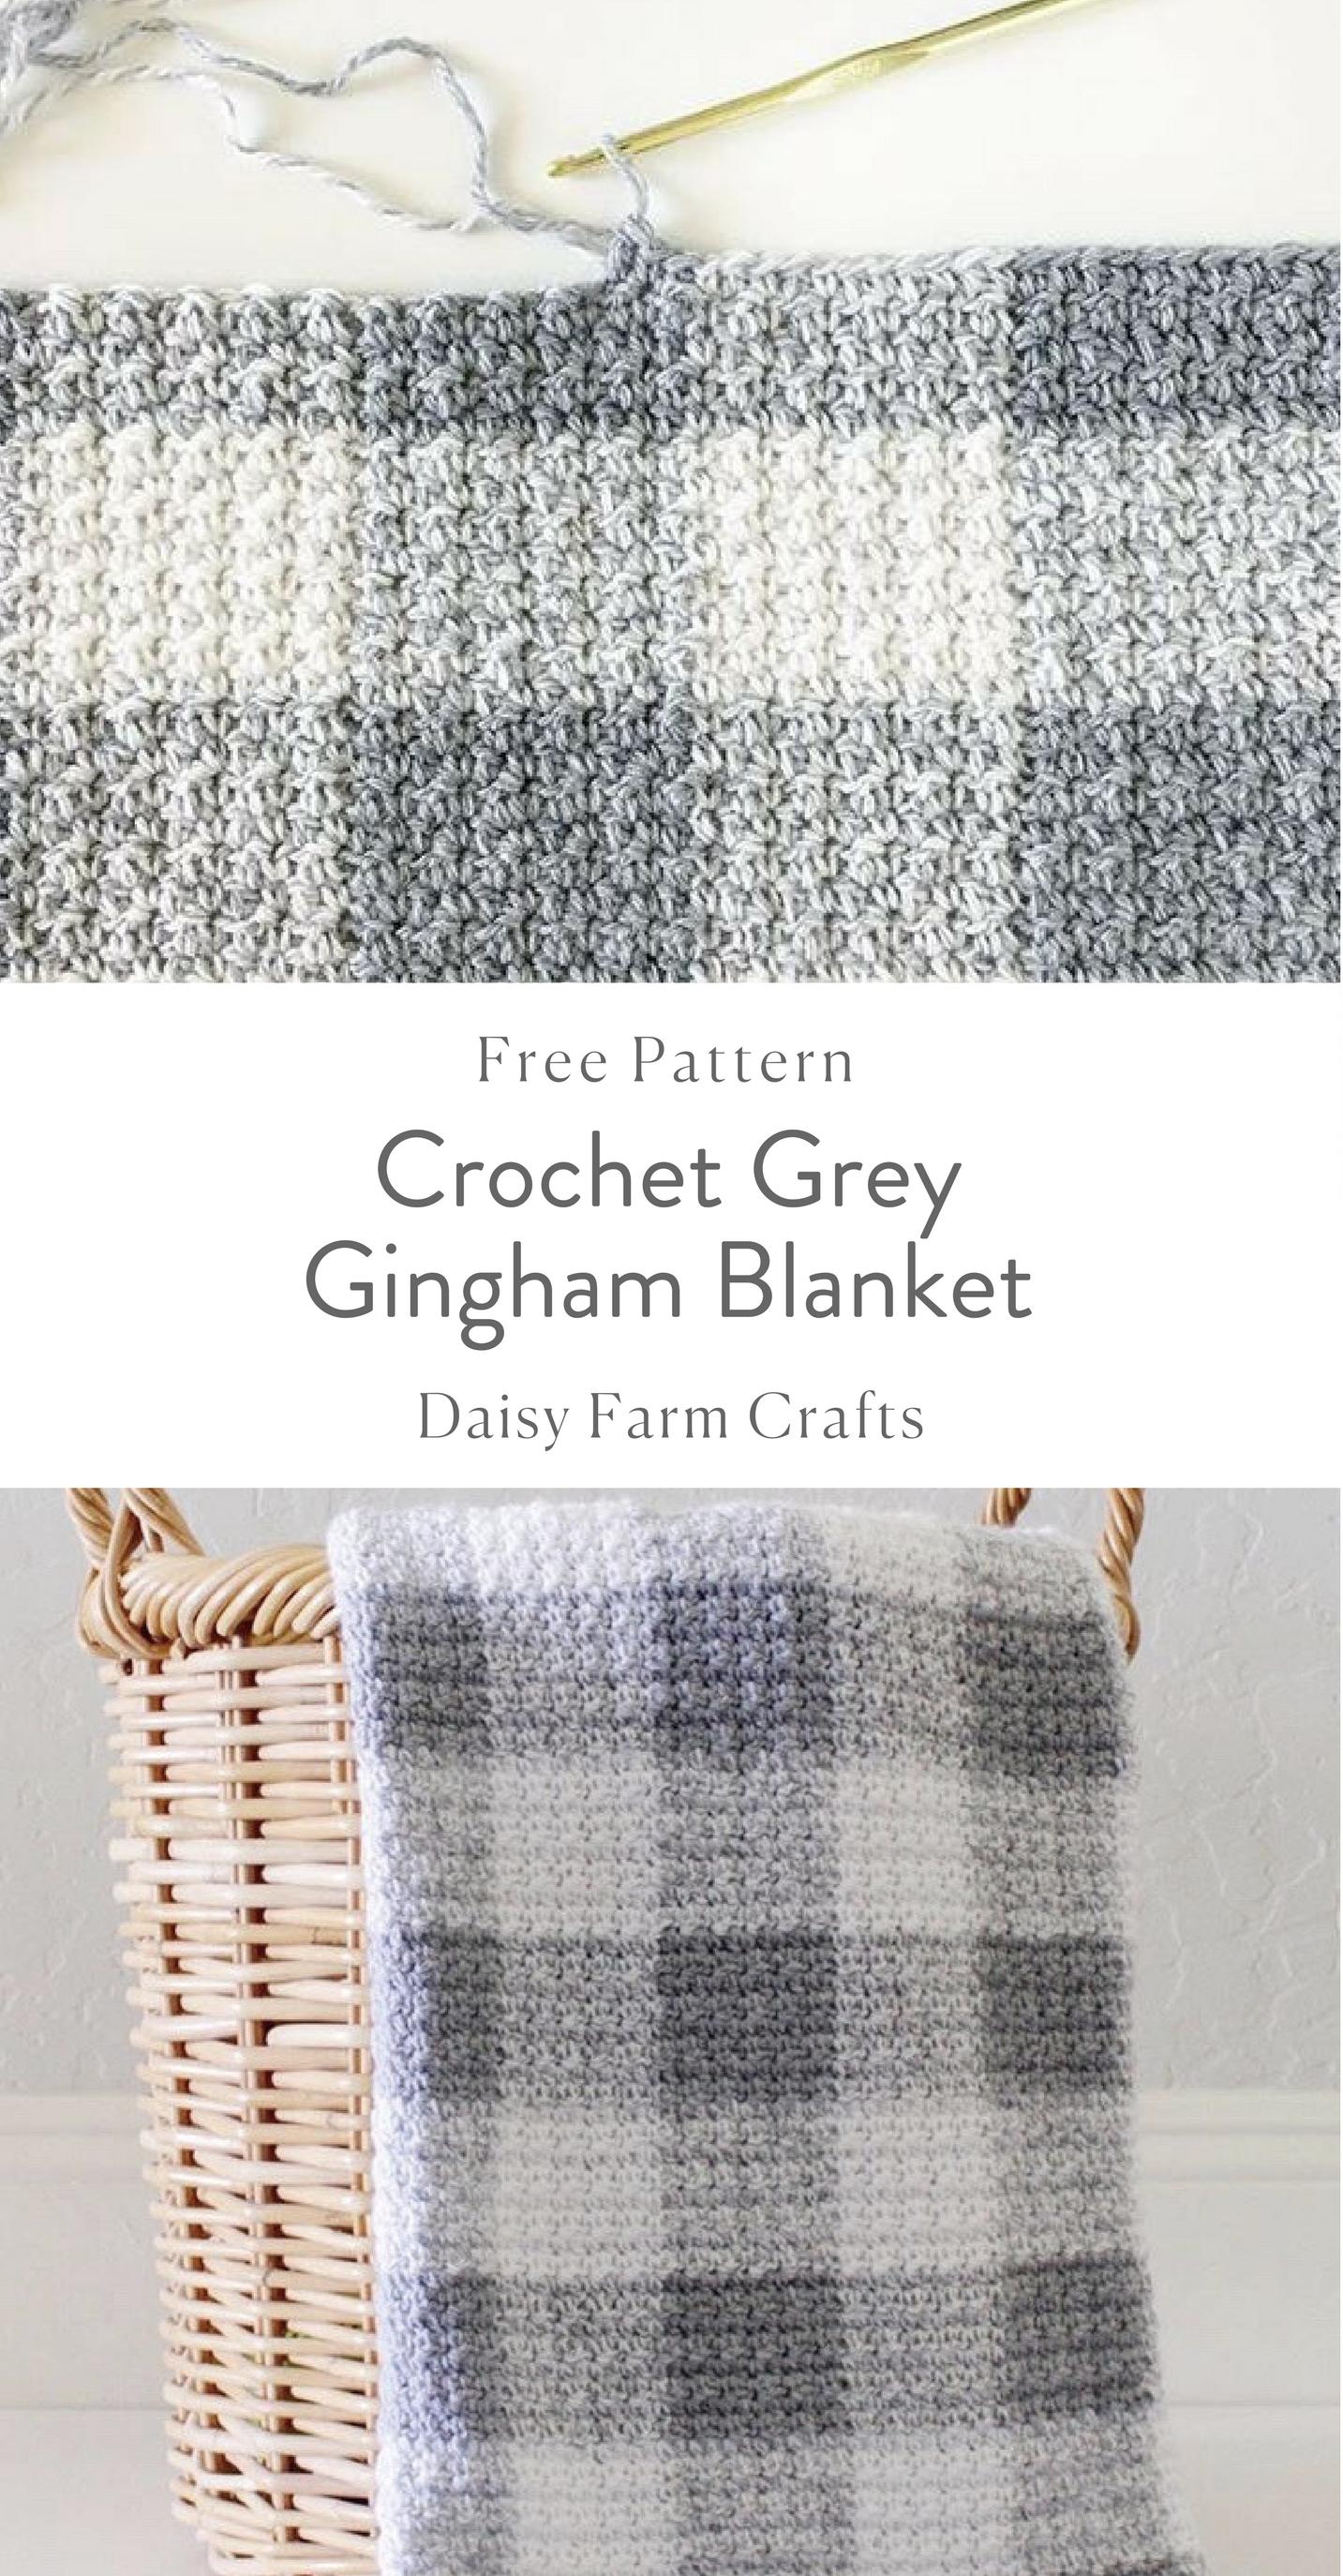 Daisy Farm Crafts Plaid Crochet Crochet Blanket Patterns Afghan Crochet Patterns